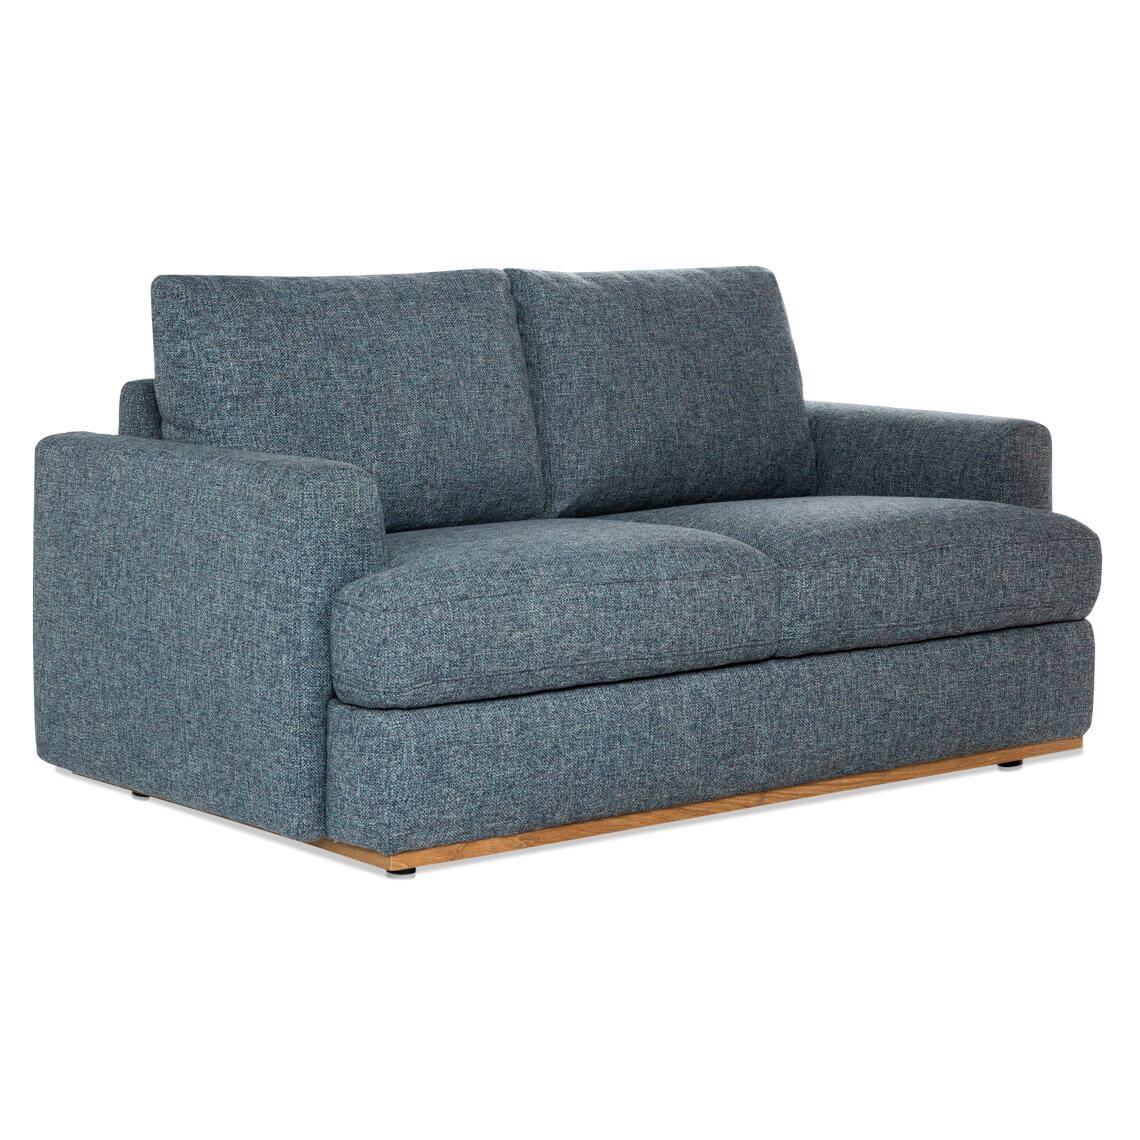 Nixon 2s Sofa Rainstorm Sofa Modular Couch Fabric Sofa